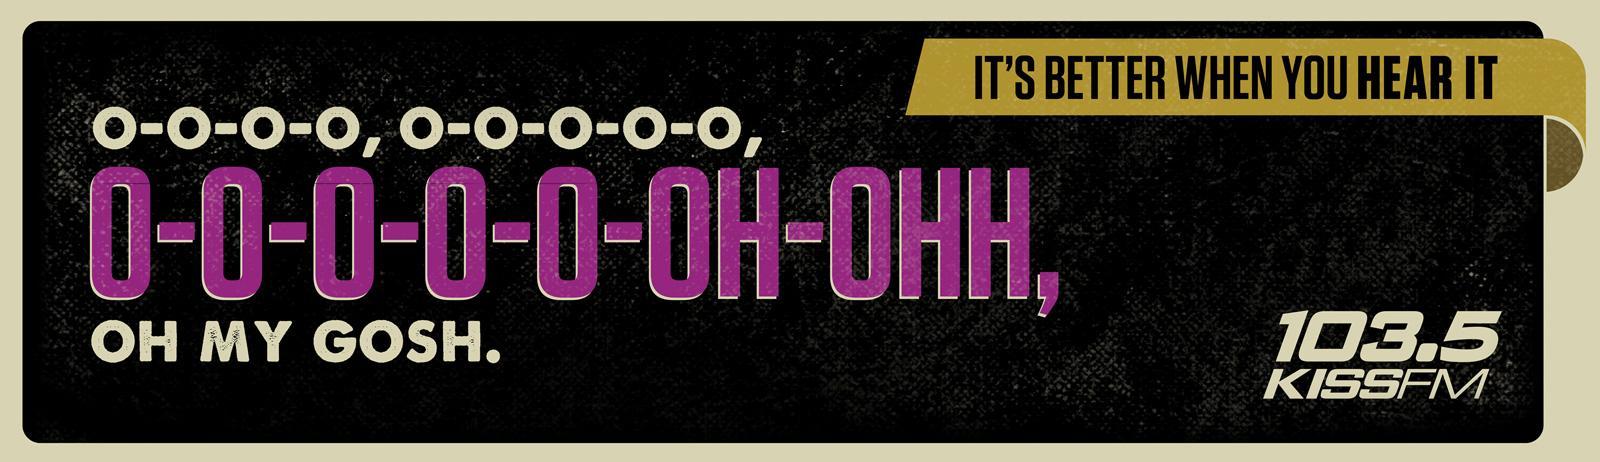 KISS FM Outdoor Ad -  OMG